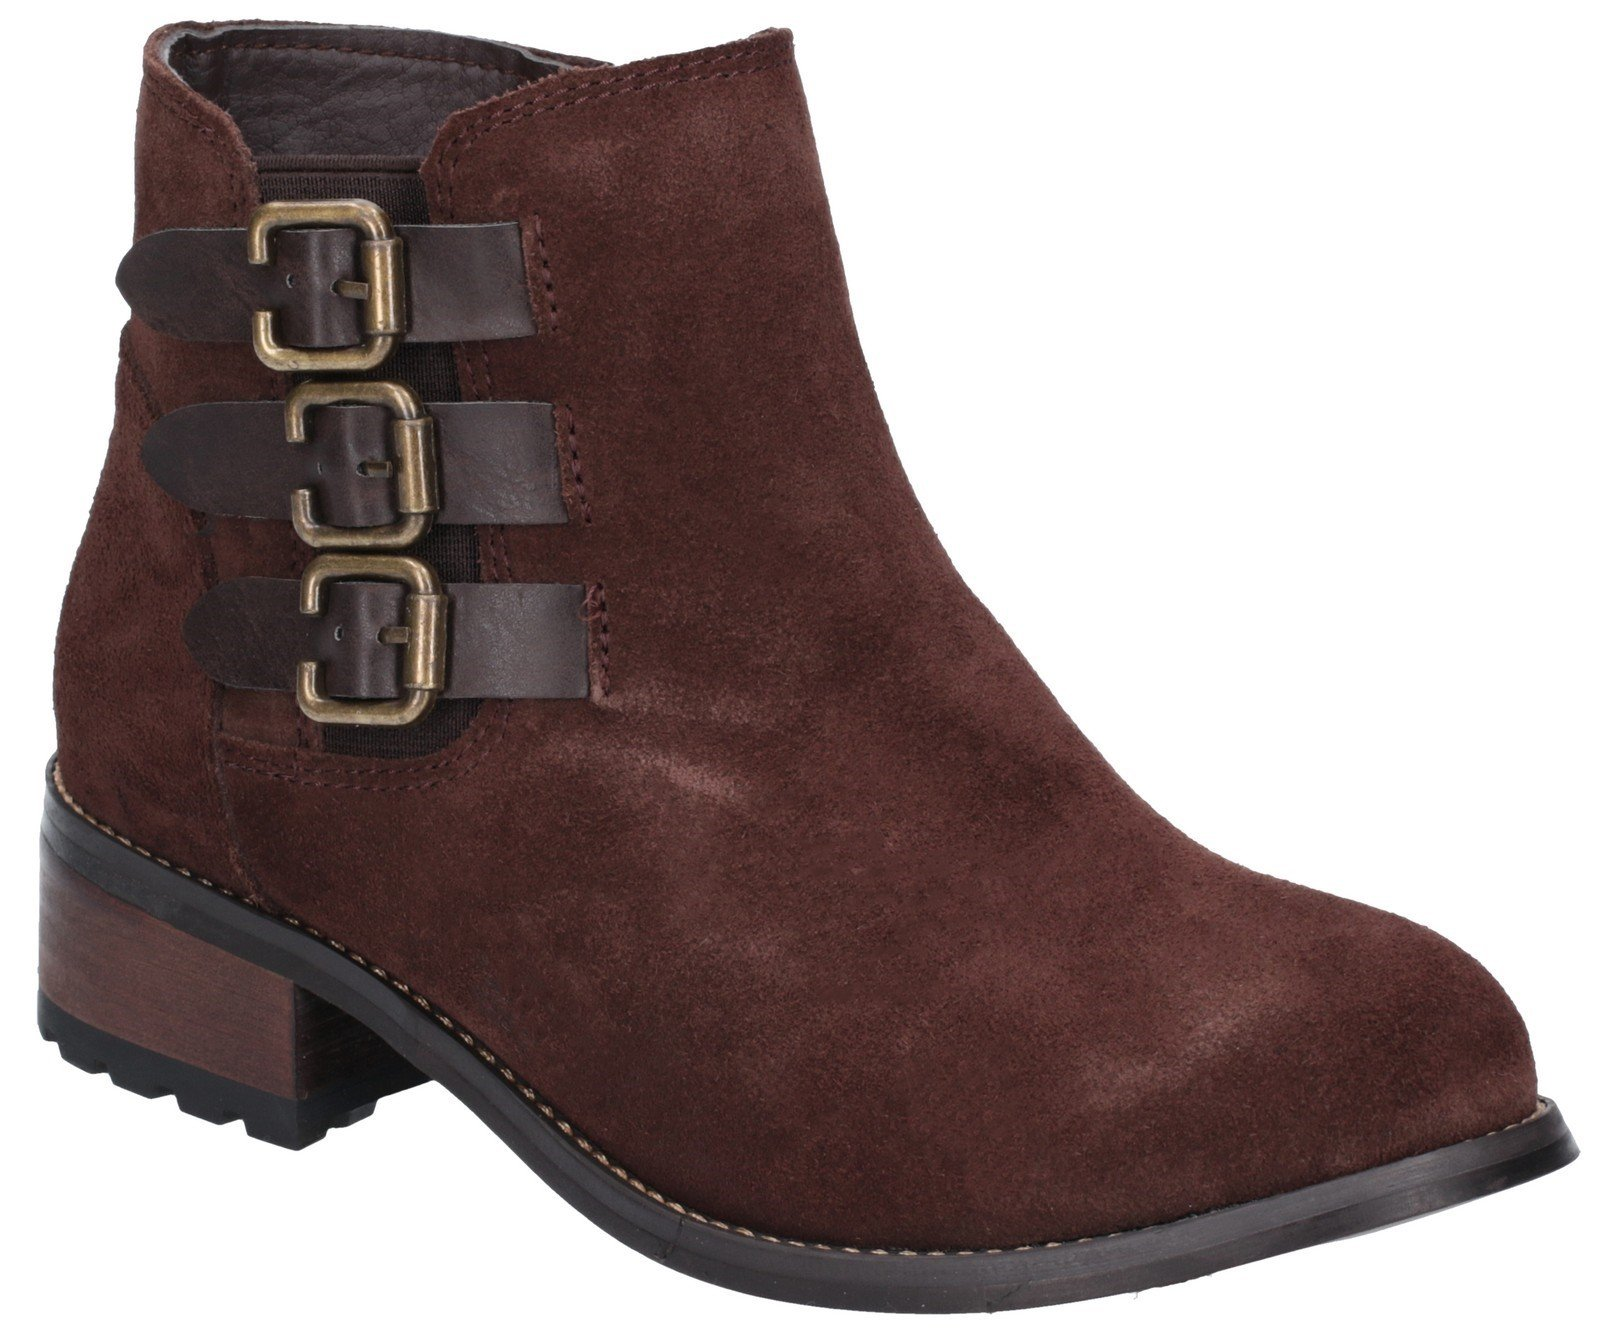 Divaz Women's Lexi Slip On Buckle Boot Black 27162-45641 - Brown 3